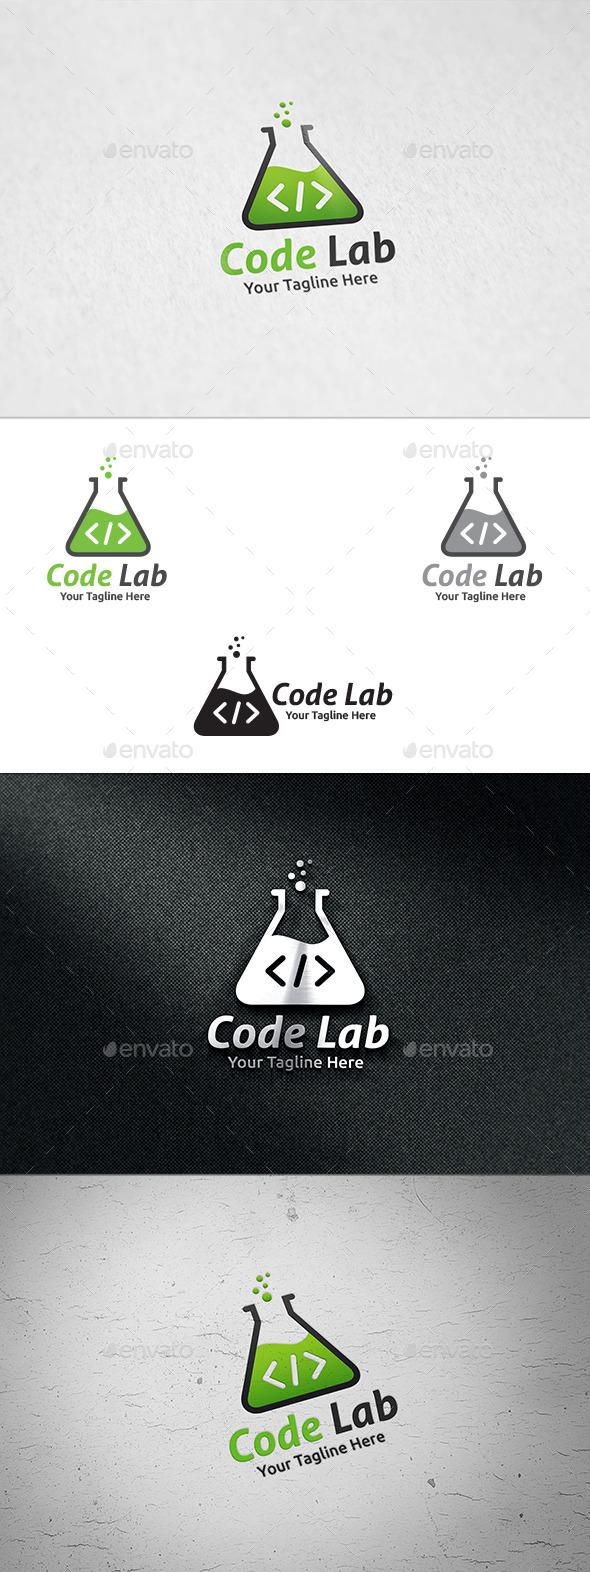 Code Lab - Logo Template